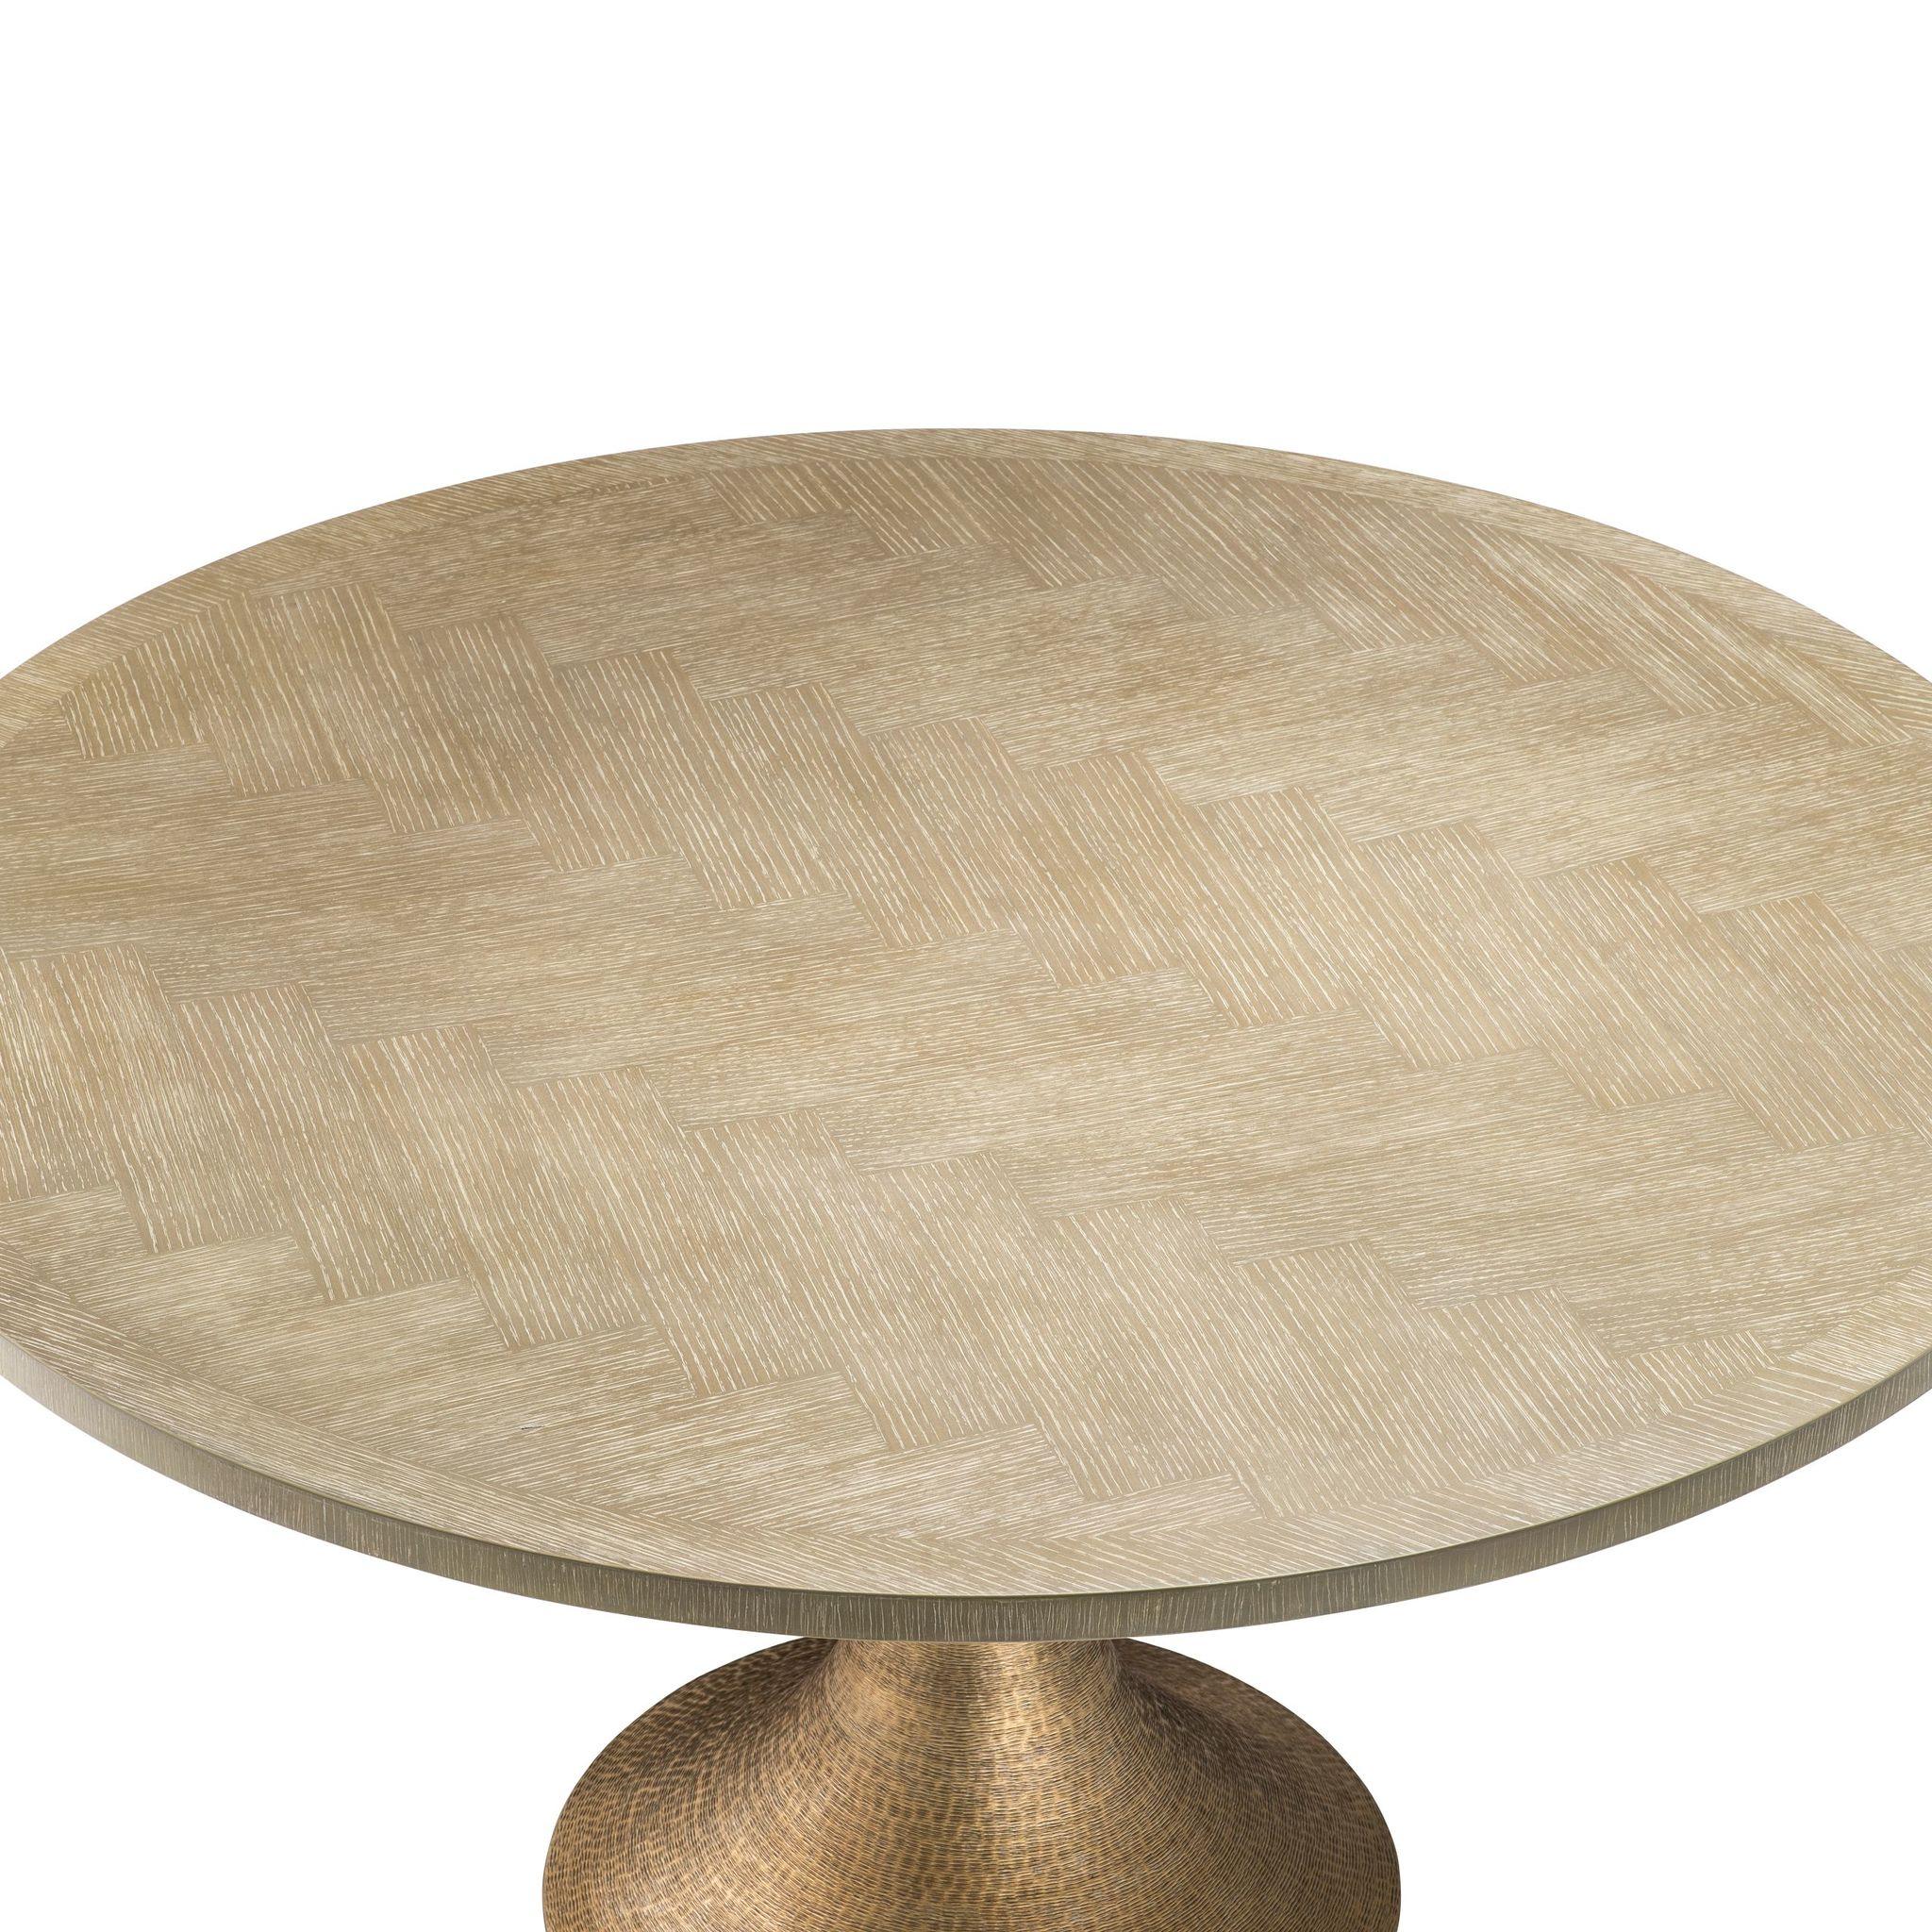 Обеденный стол Eichholtz 113280 Melchior